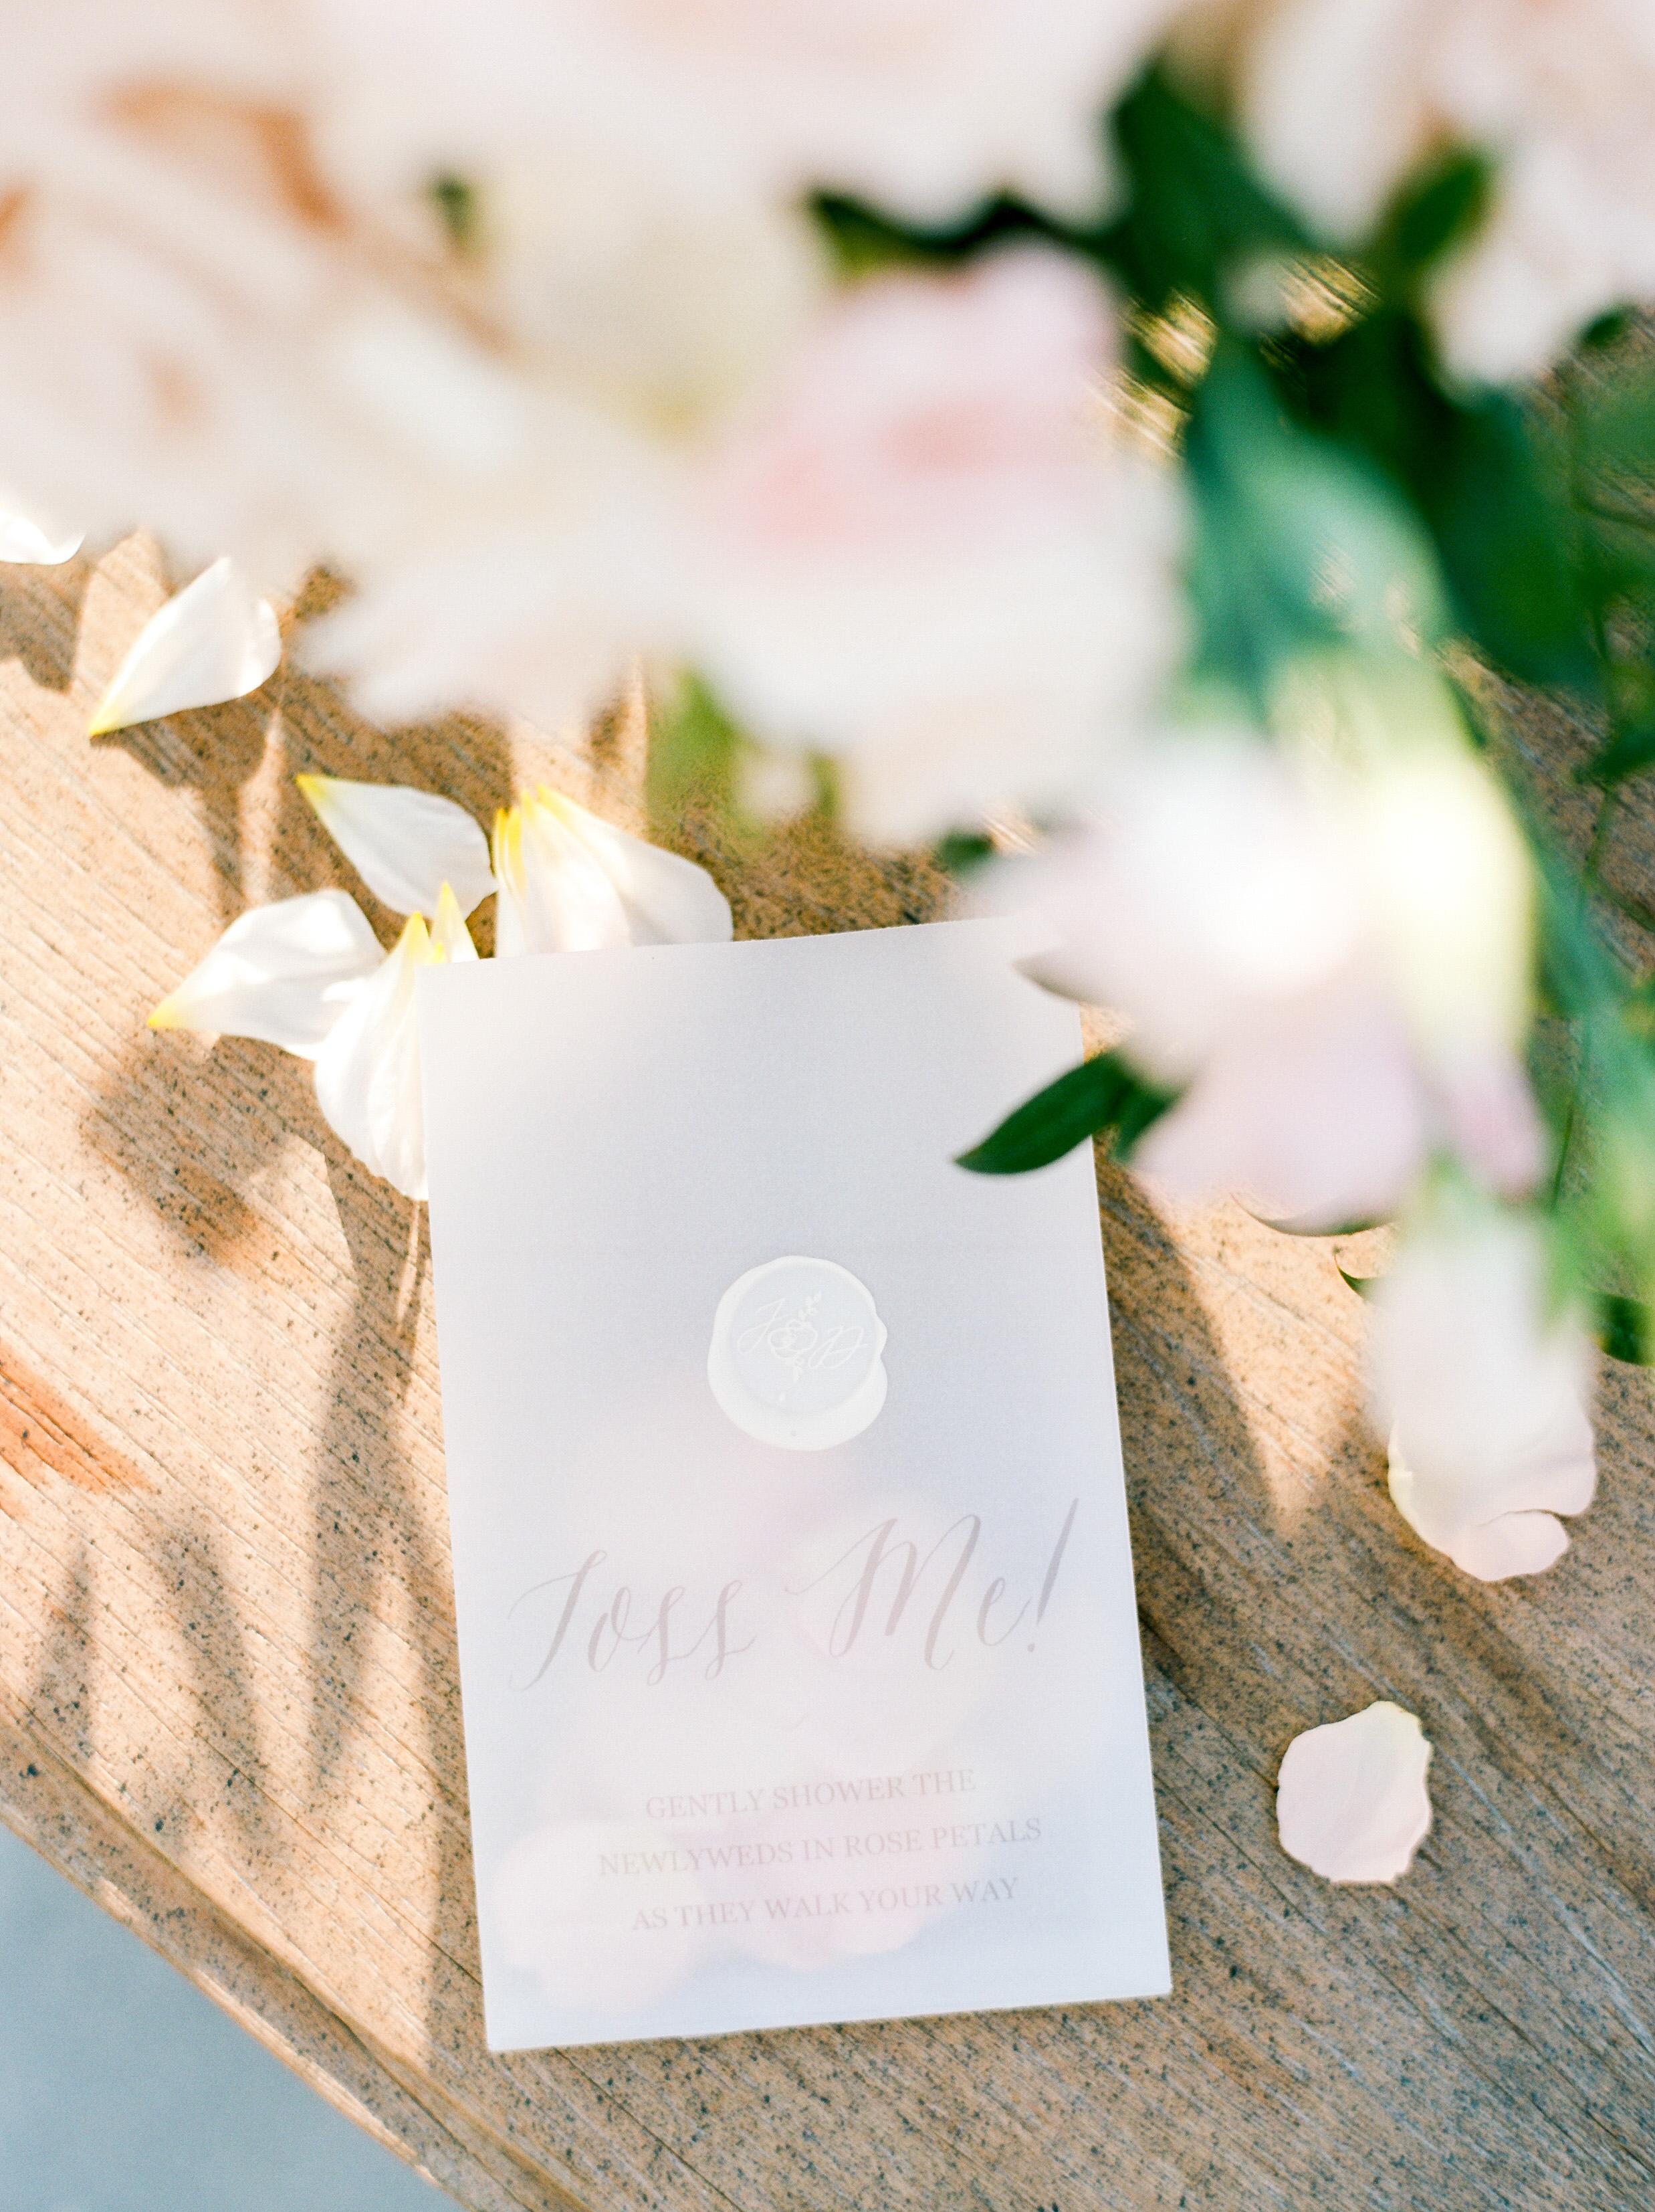 Martha-Stewart-Wedding-Dana-Fernandez-Photography-Josh-Texas-Film-Houston-Wedding-Fine-Art-Photographer-McGovern-Centennial-Gardens-Top-Best-80.jpg